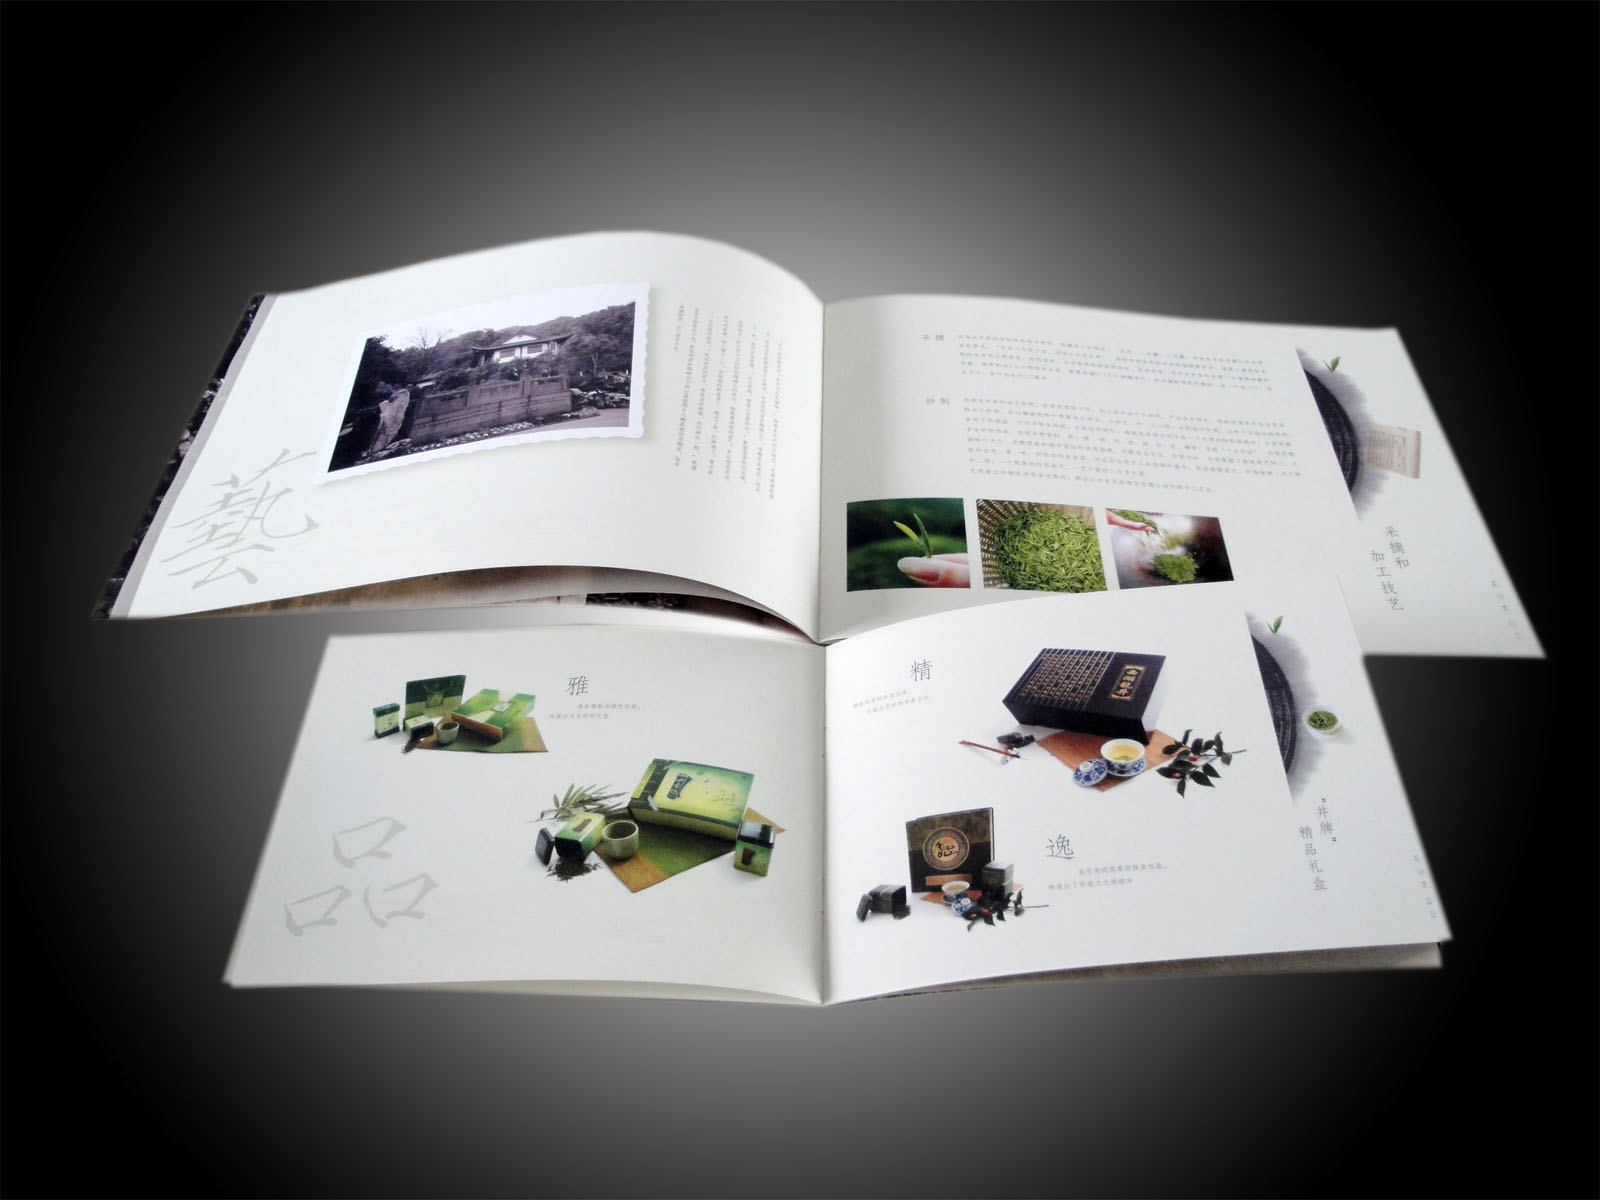 چاپ دیجیتال کاتالوگ حرفه ای